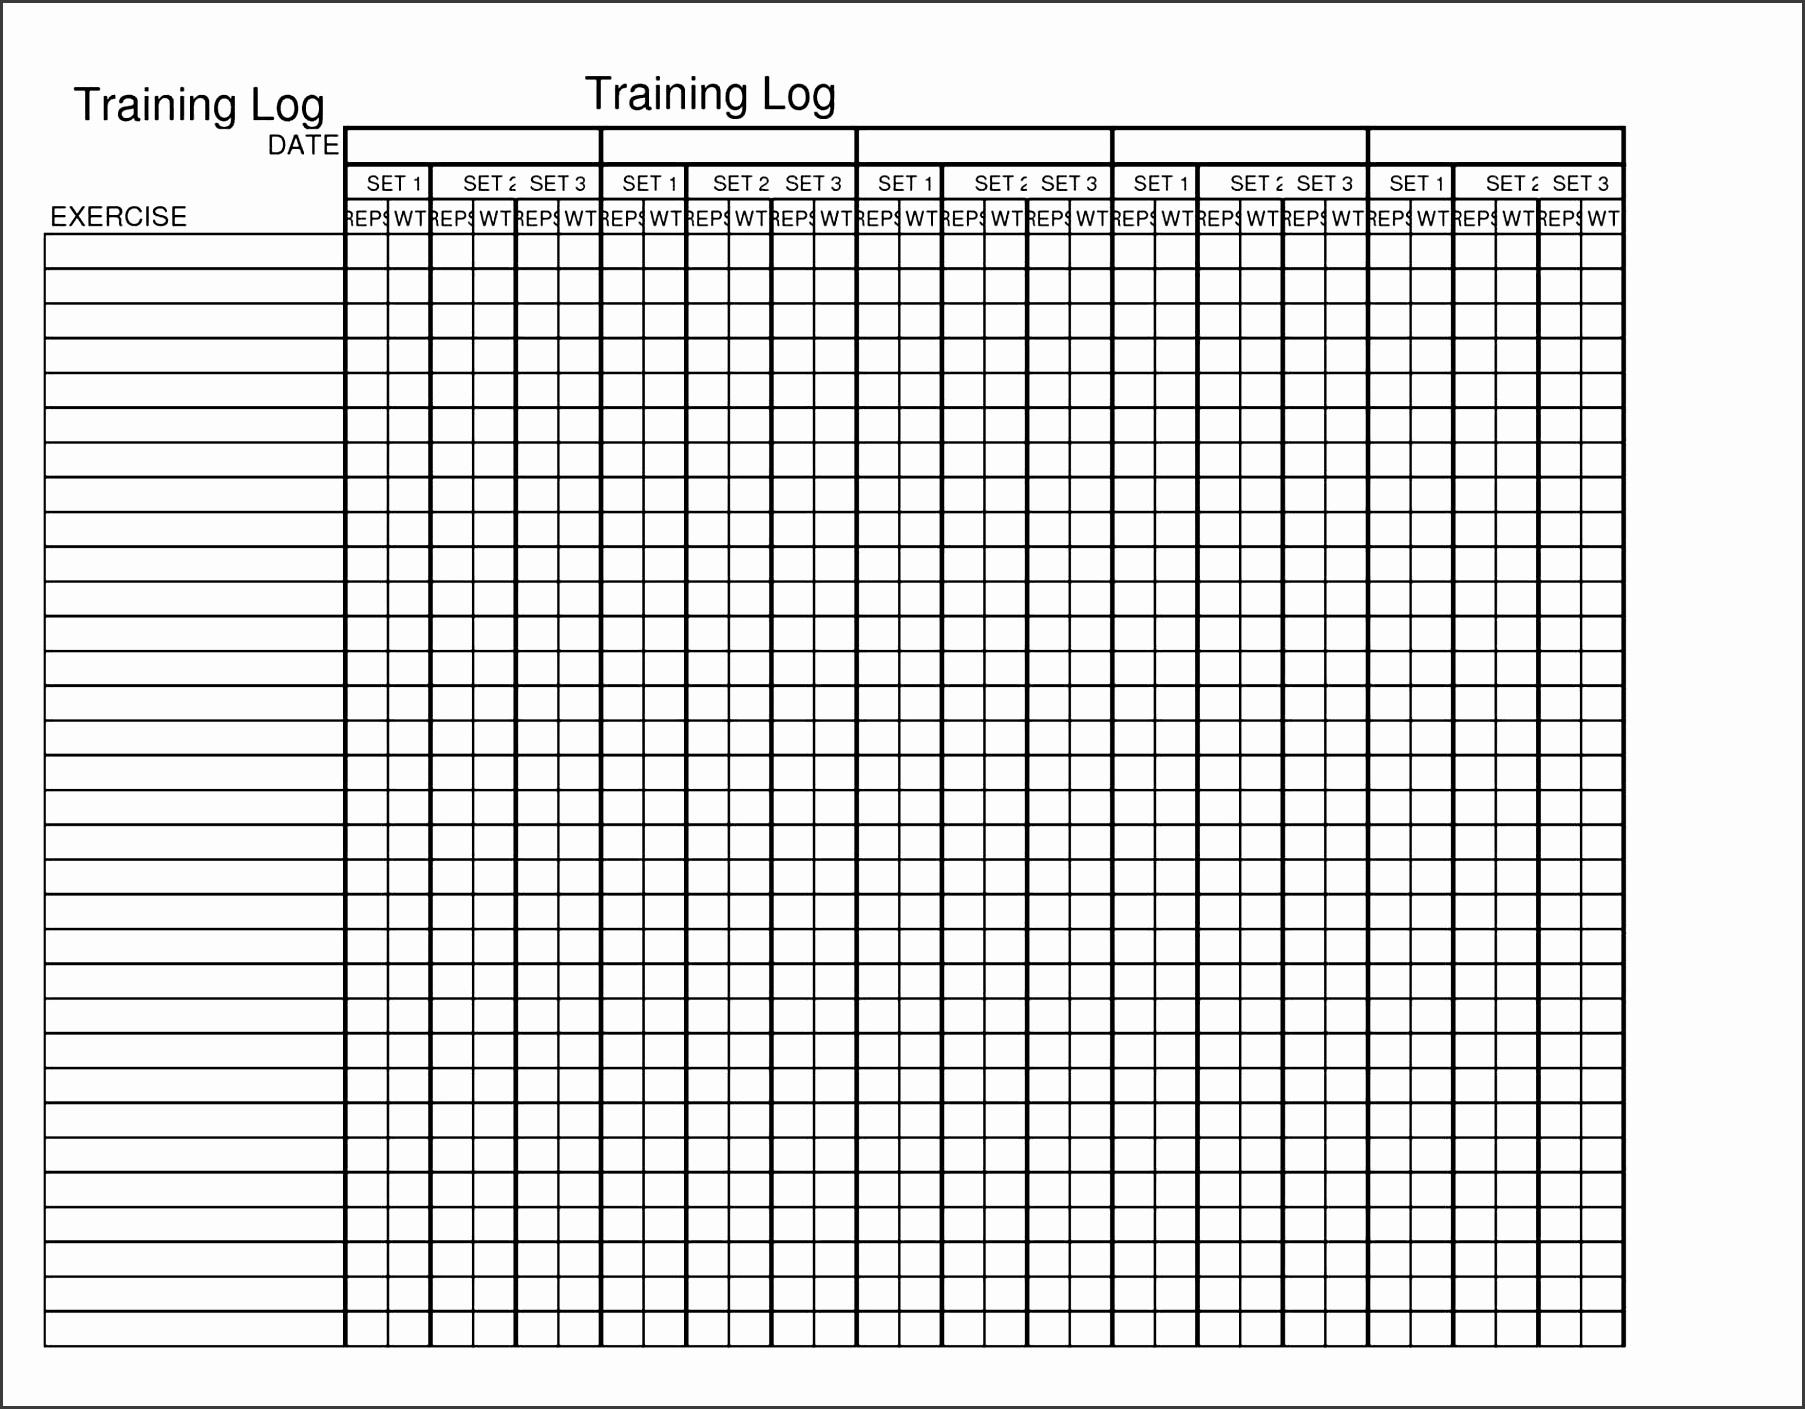 free expense report smartsheet free excel call log template expense report templates smartsheet teacher phone log